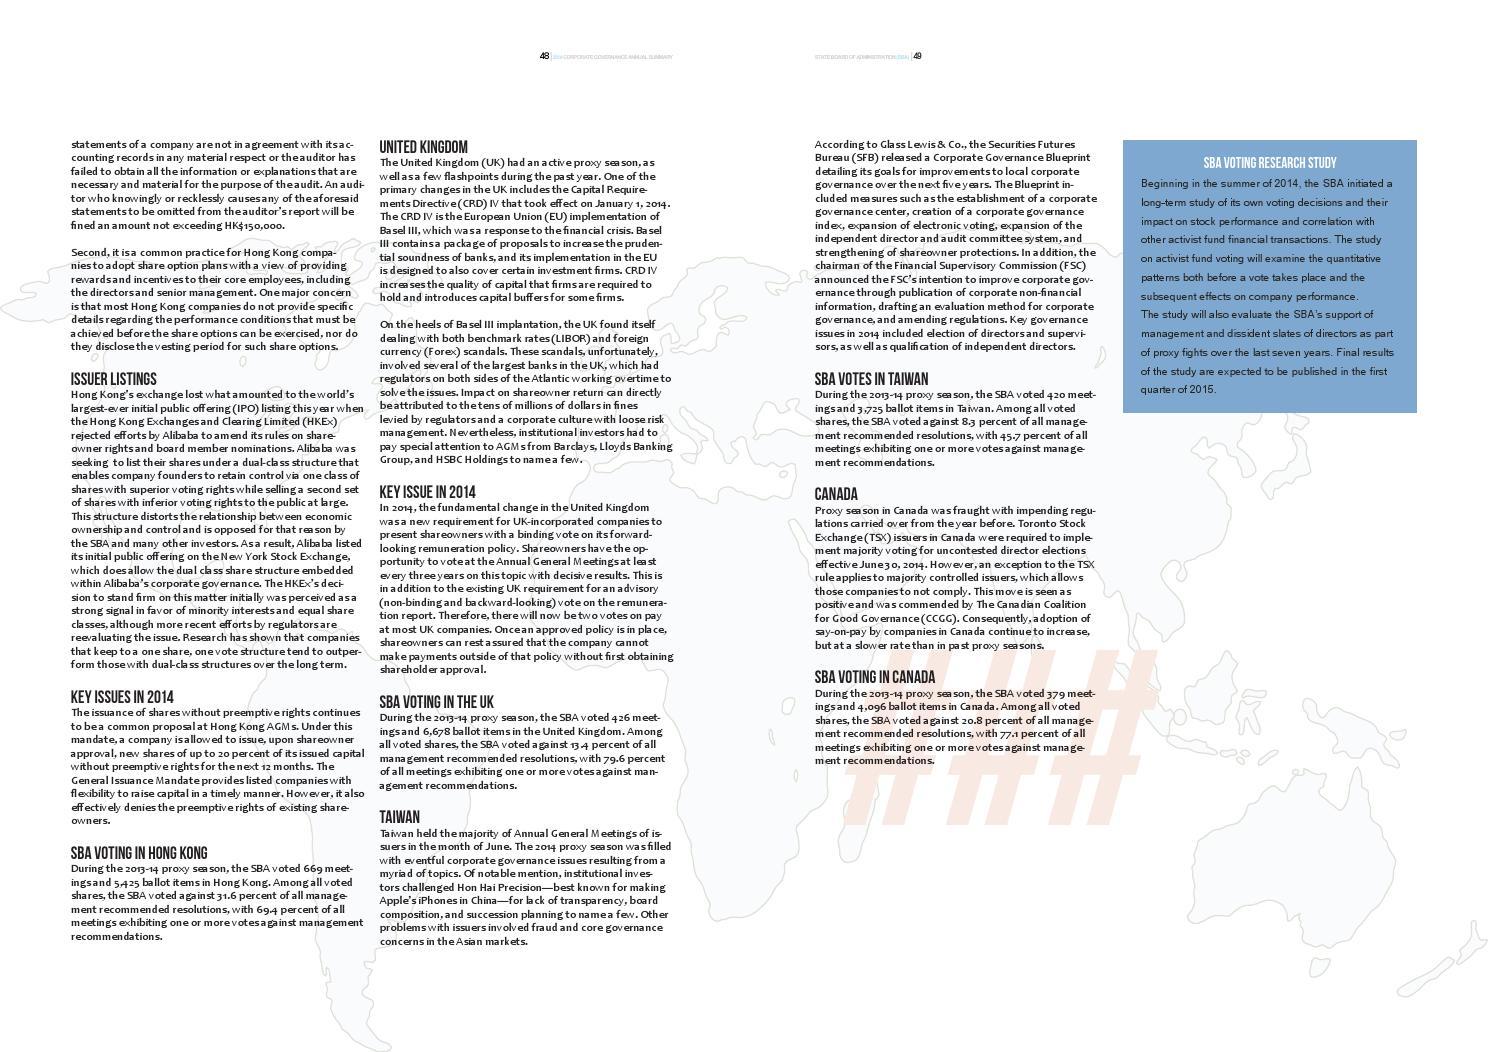 2014 SBA Annual Governance Summary by Michael McCauley - issuu